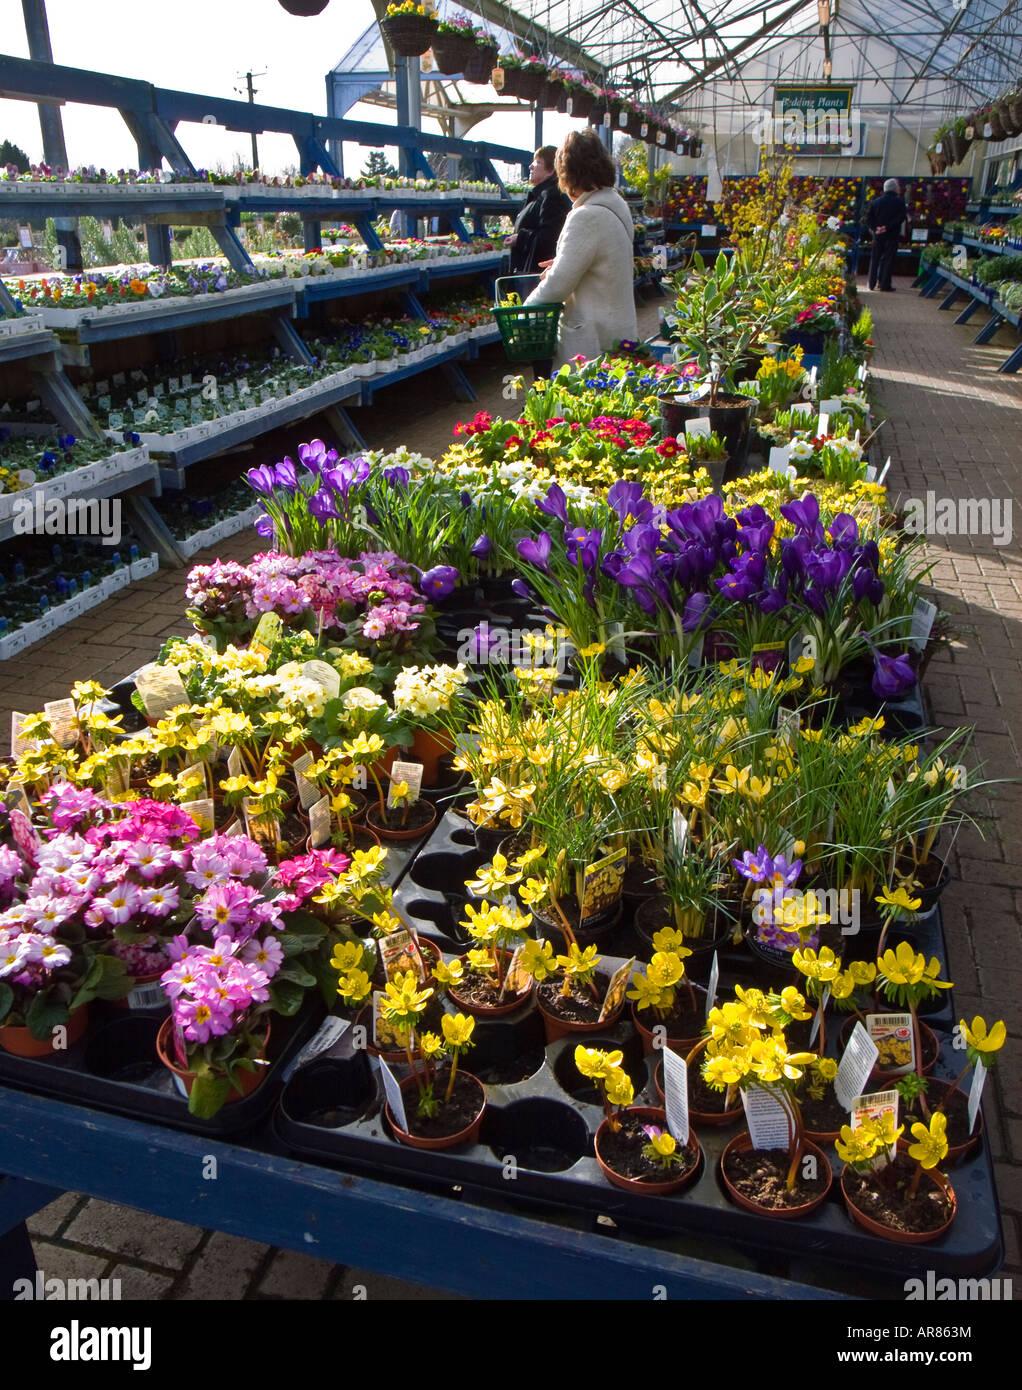 Spring Flowers For Sale In A Garden Centre England February Uk Eu